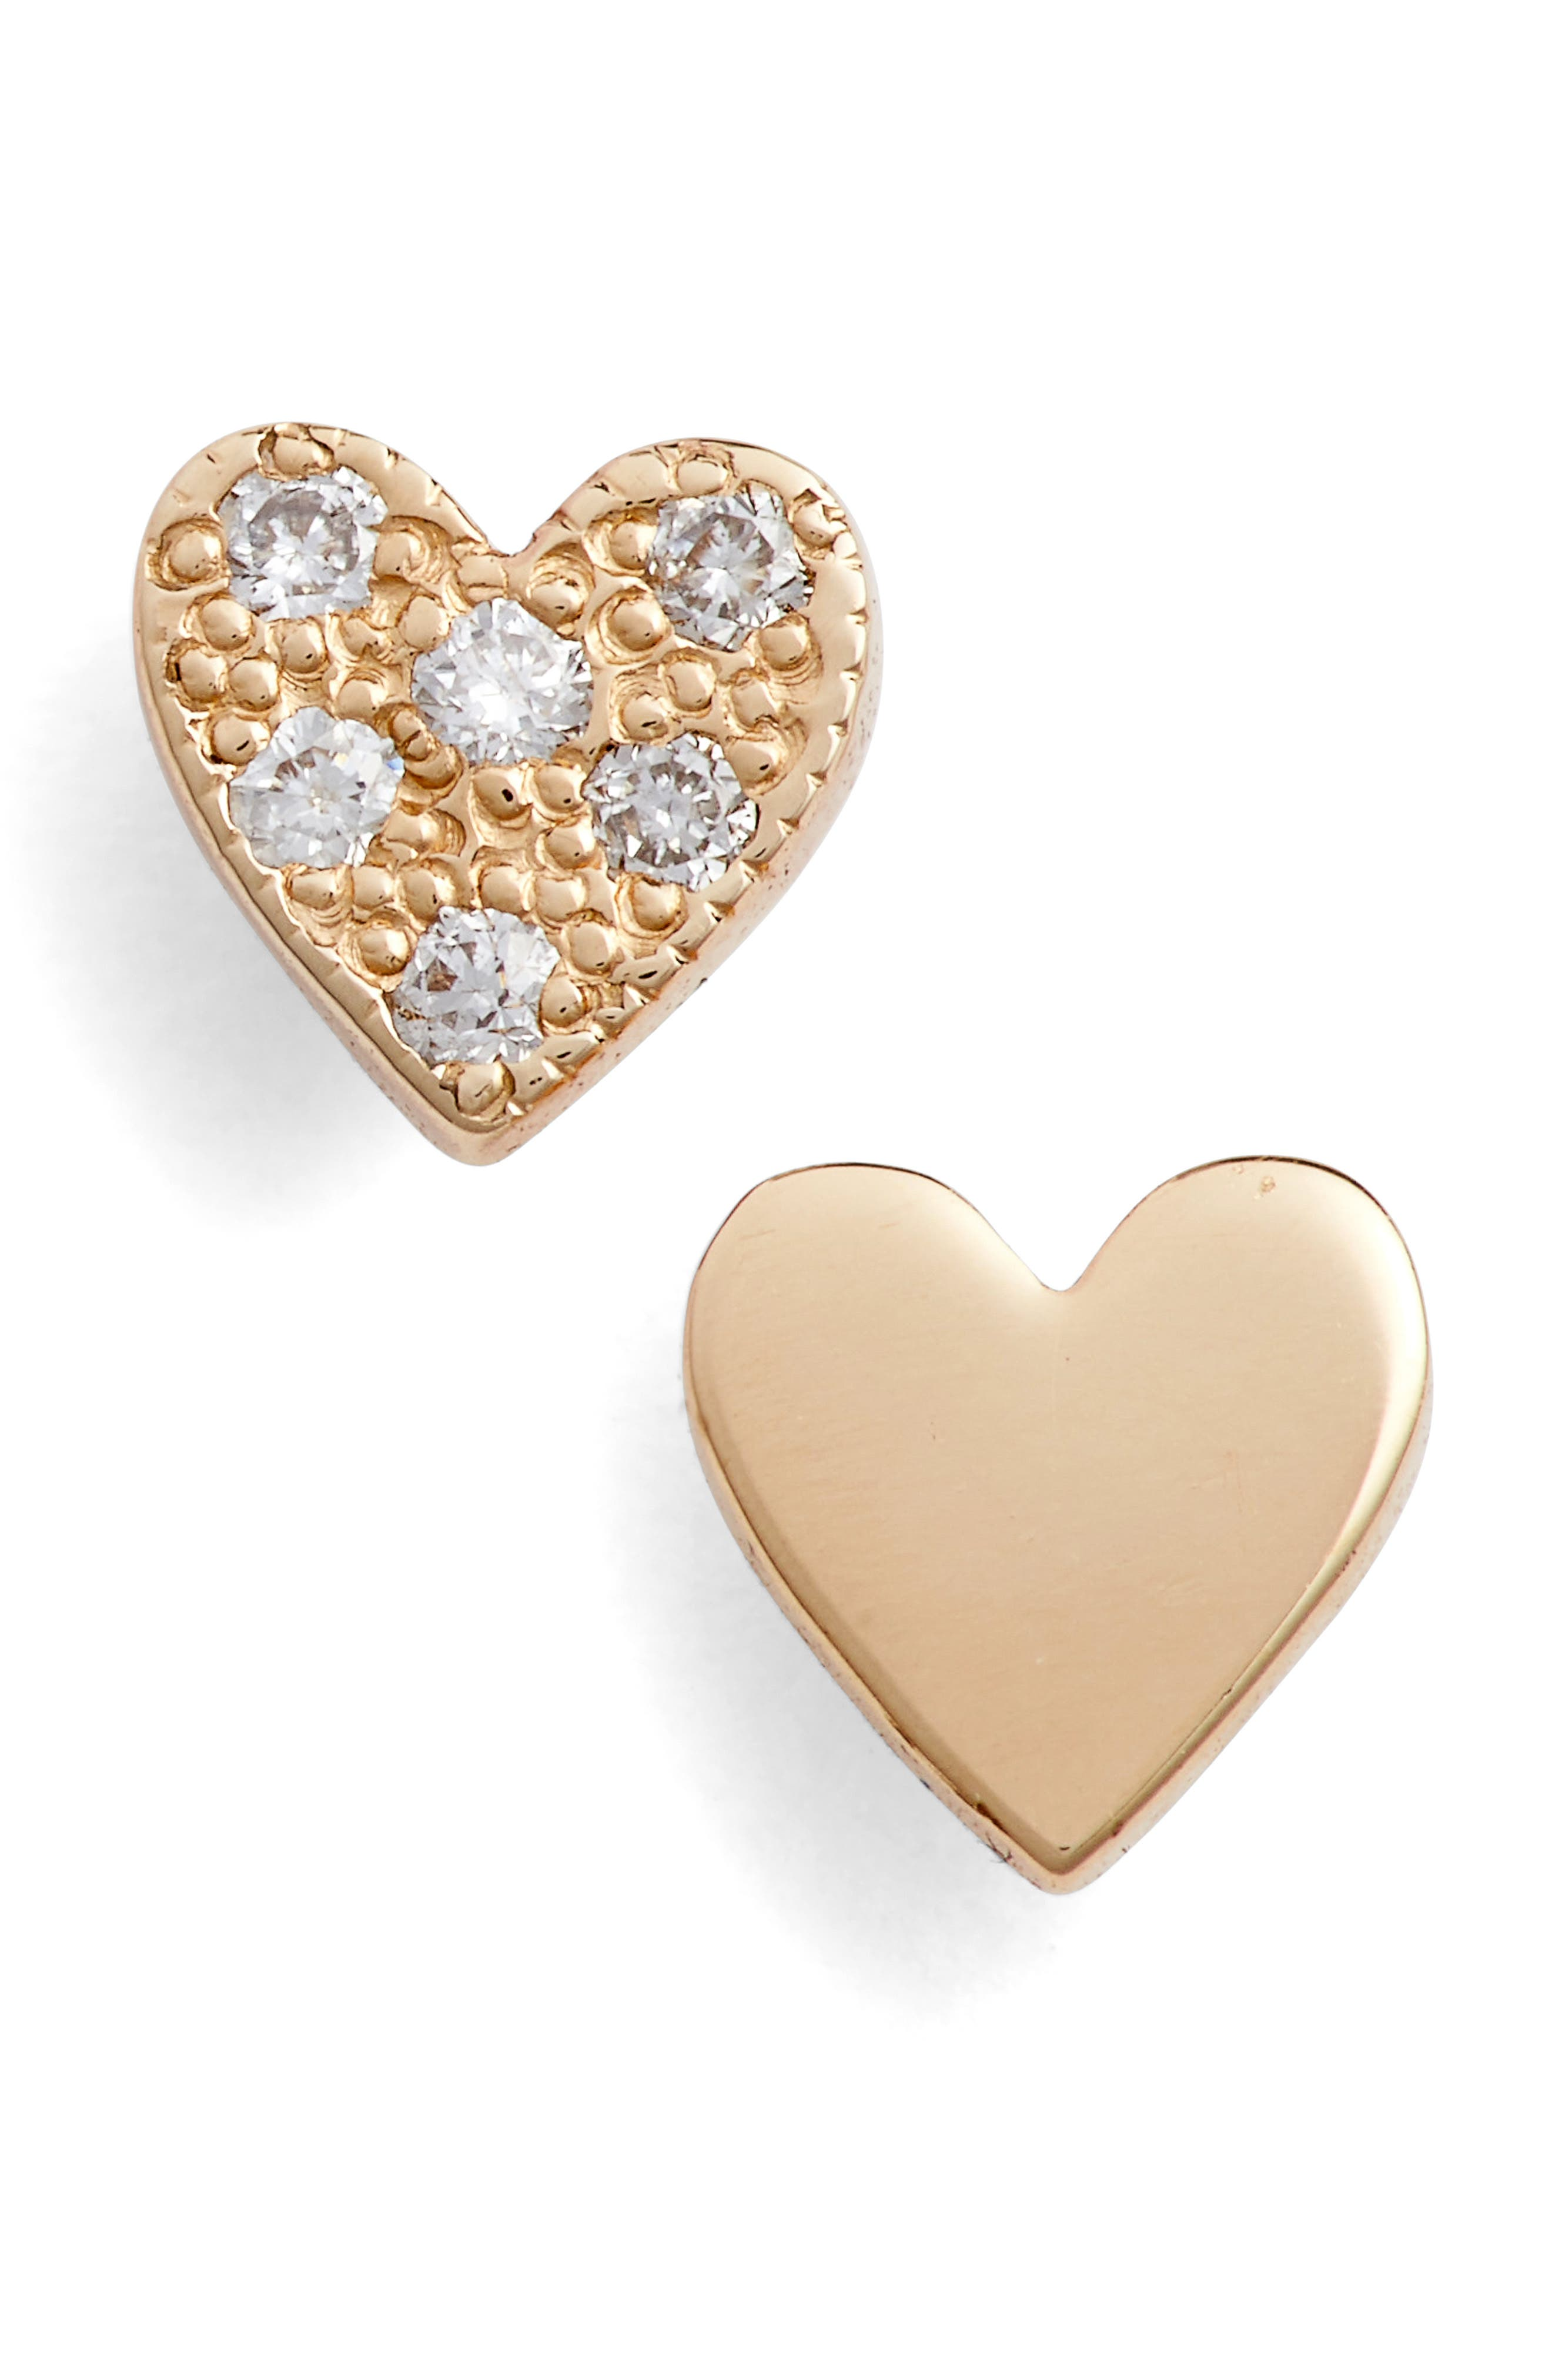 Alternate Image 1 Selected - Zoë Chicco Pavé Diamond Heart Stud Earrings